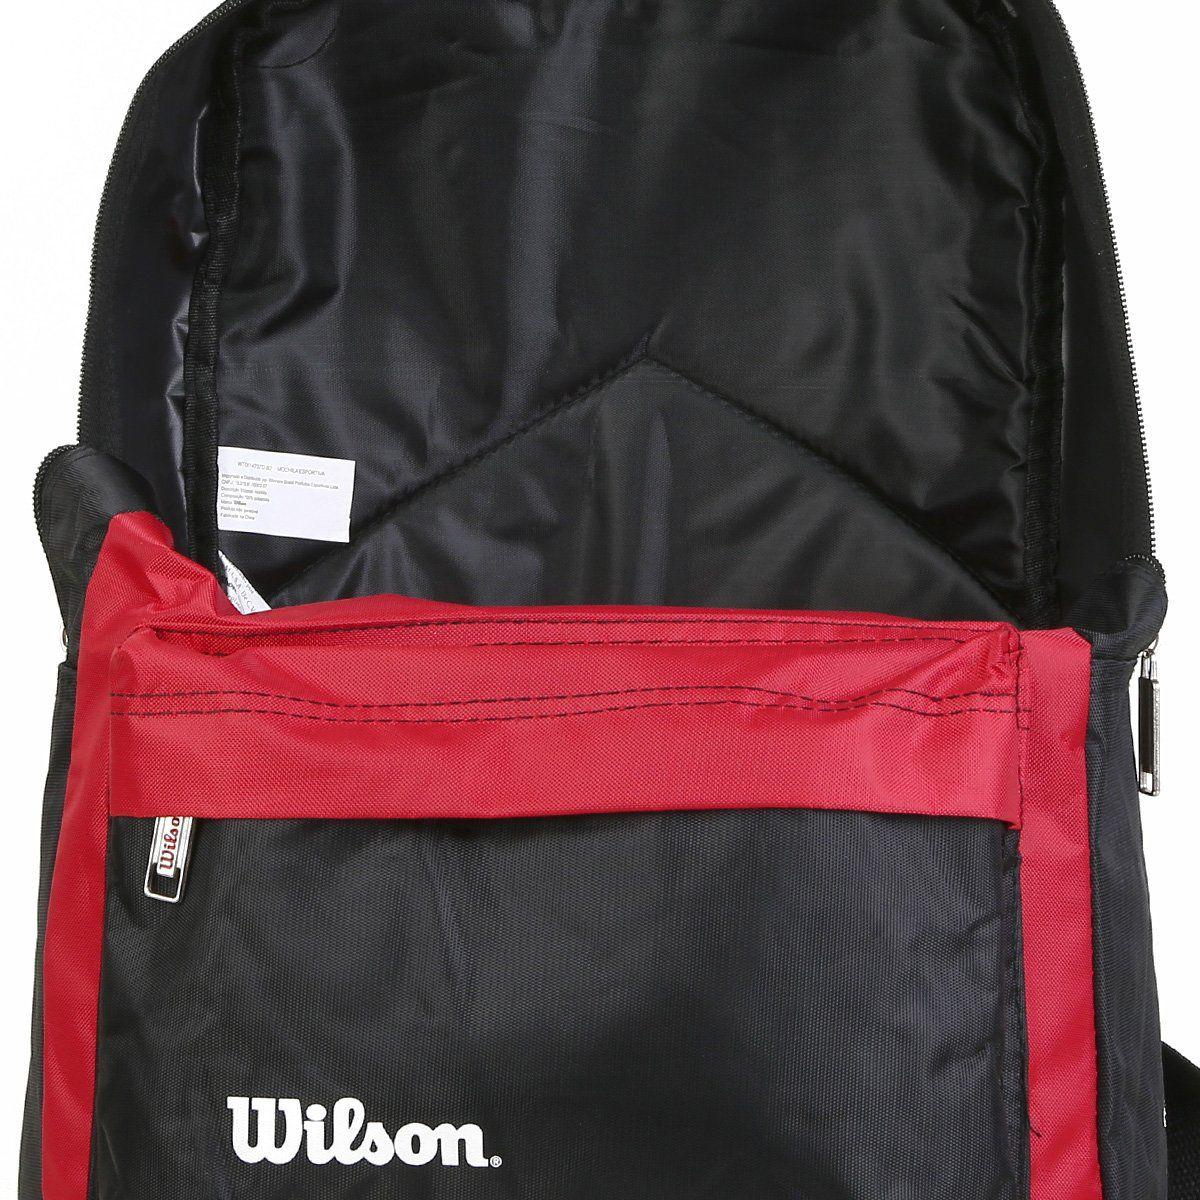 Mochila Wilson Esp WTIX14707DB2 - Vermelha  - REAL ESPORTE